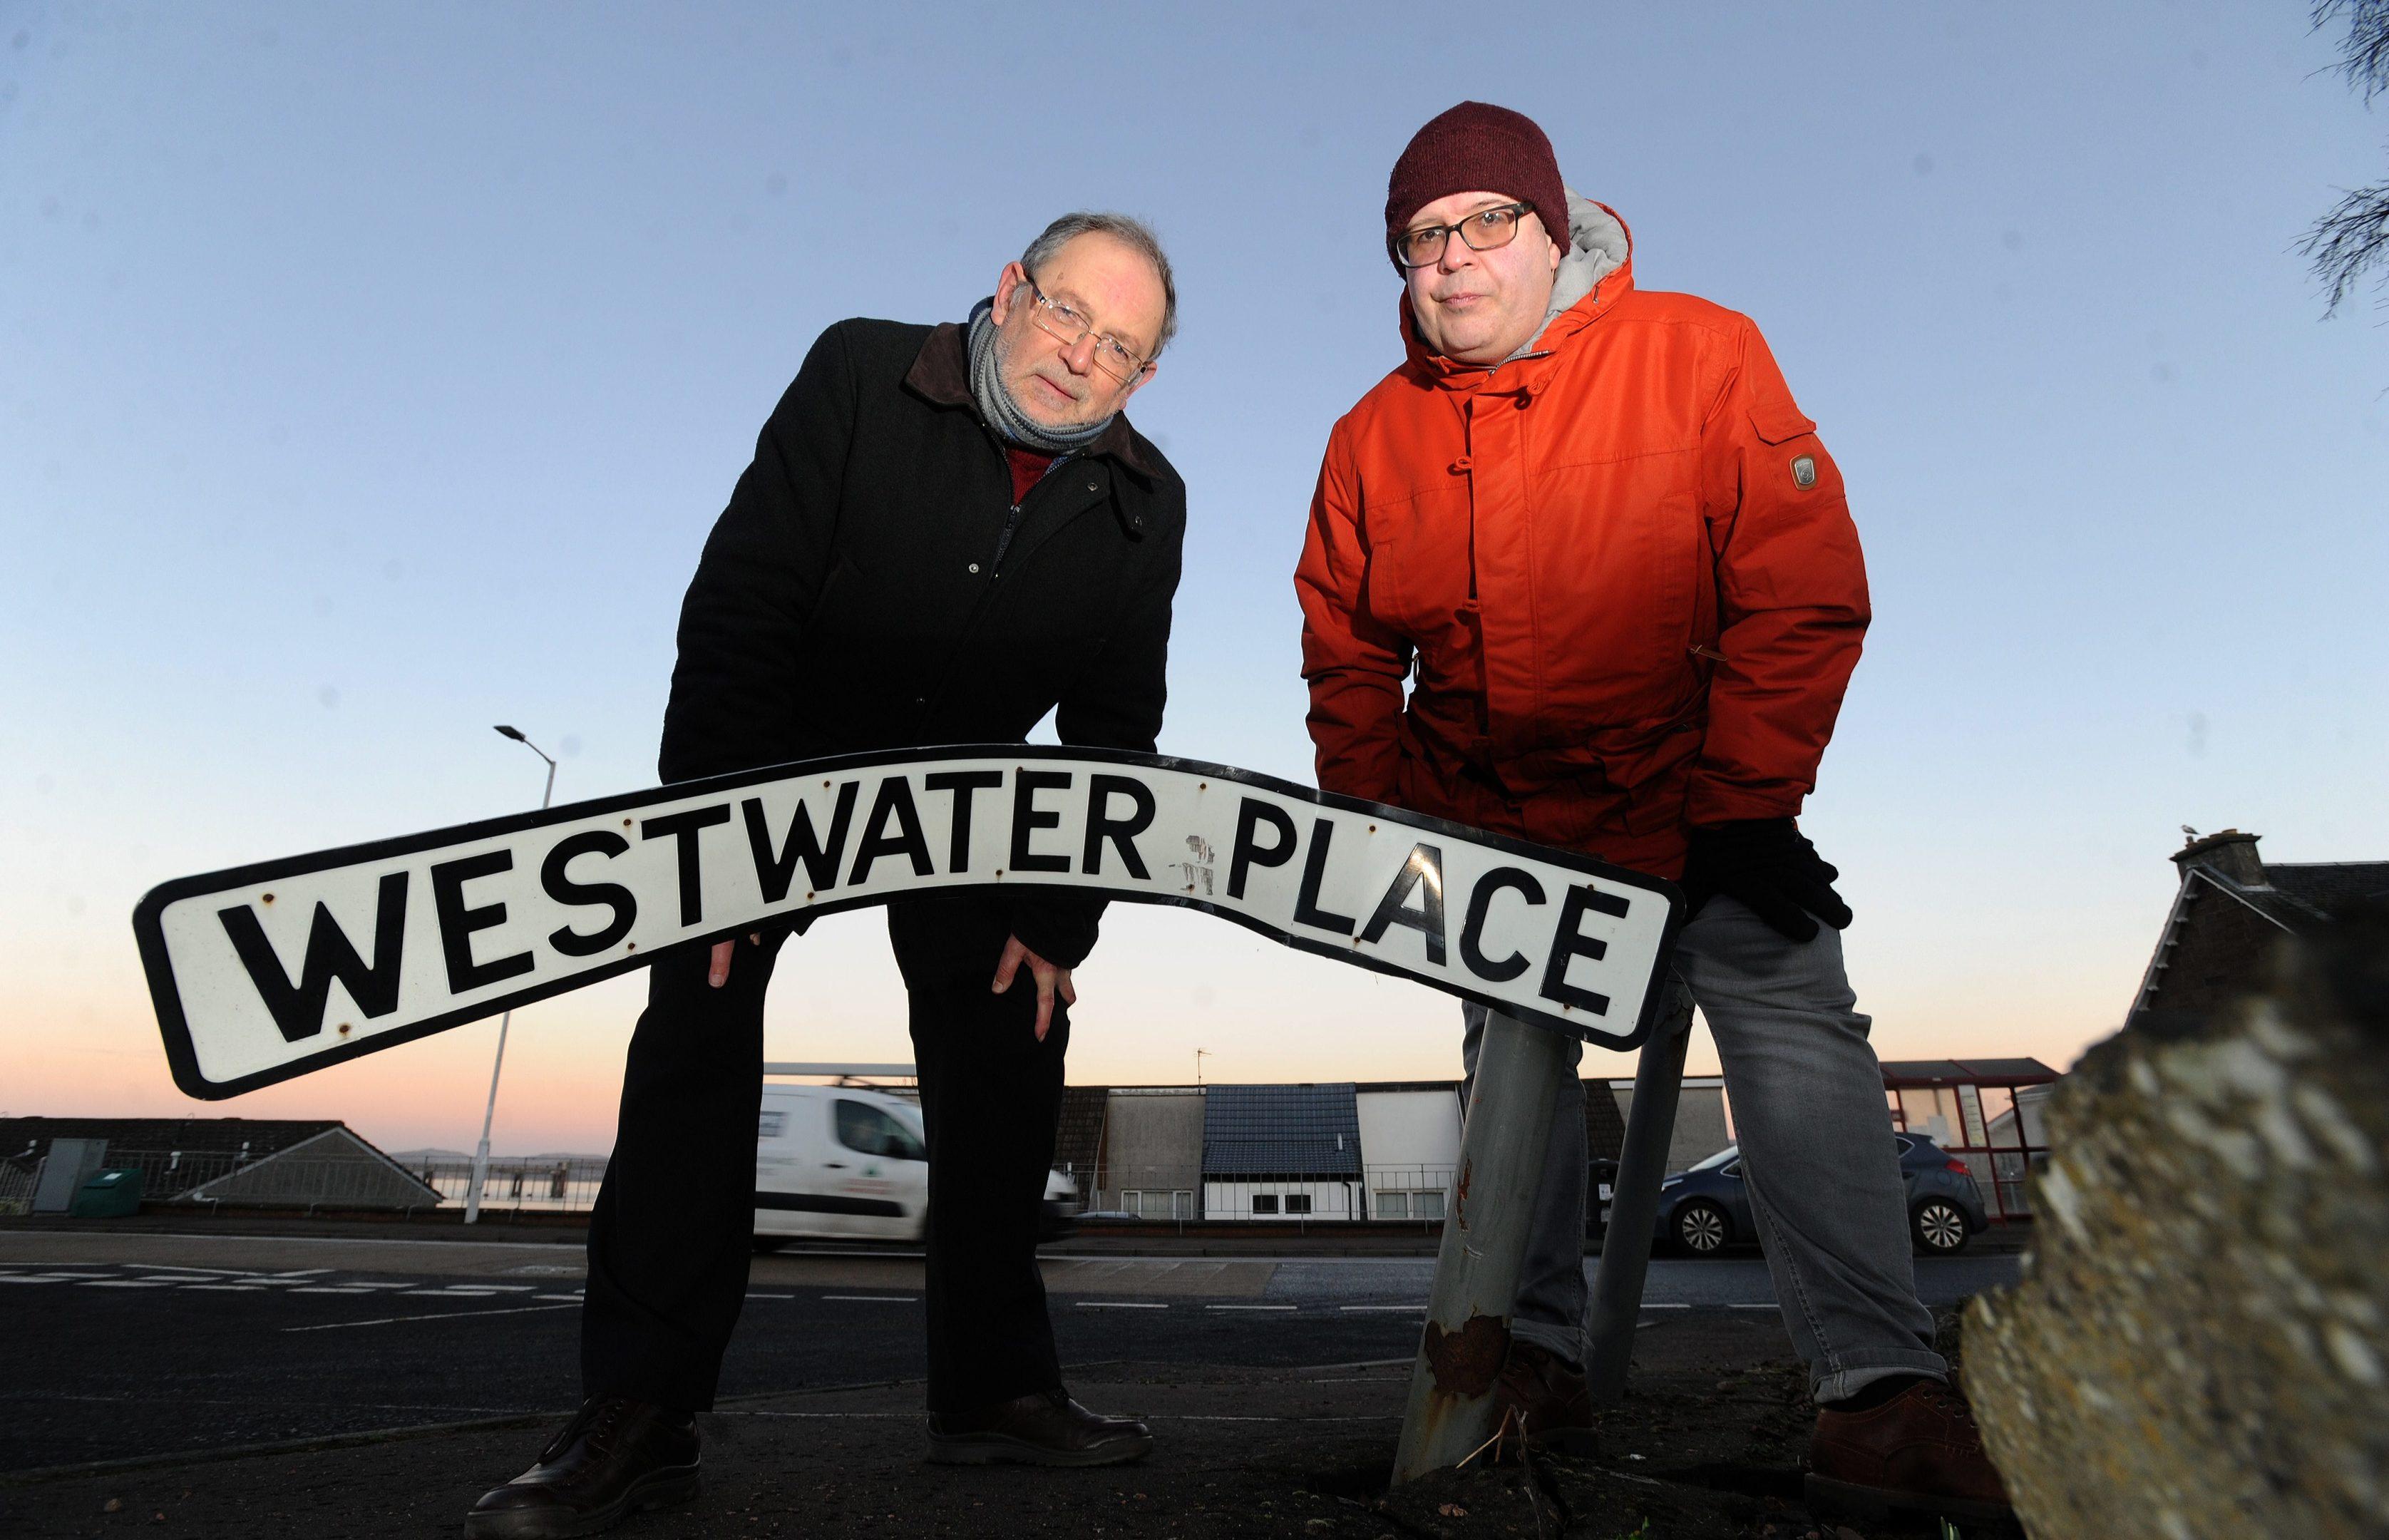 Councillor Tim Brett and community councillor Jonny Tepp